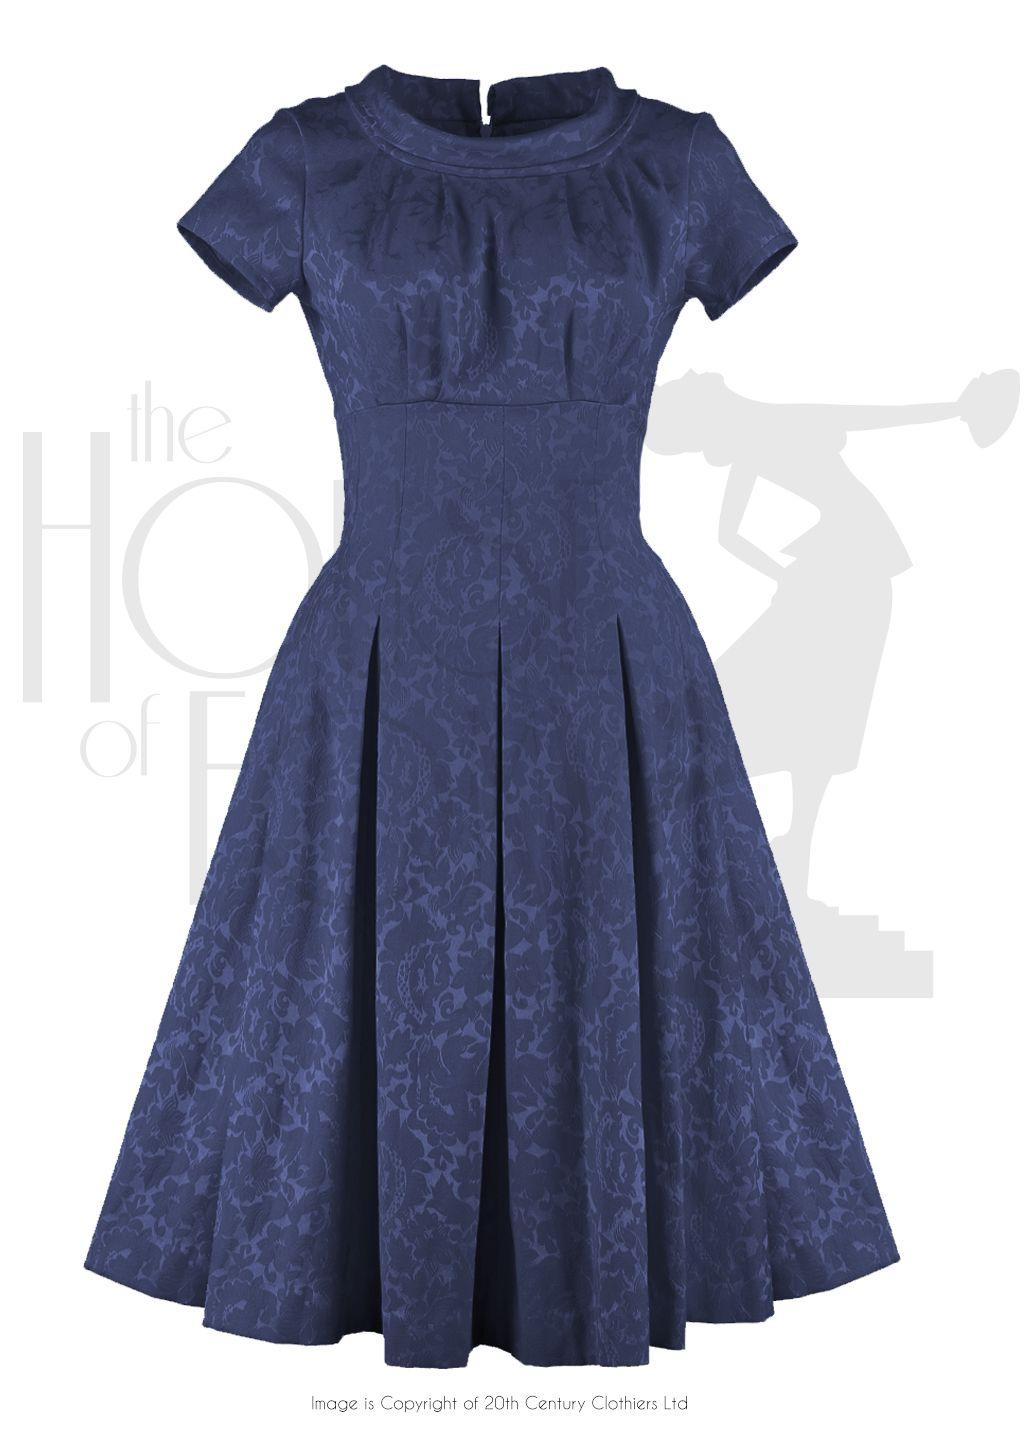 1950s Dresses 56d43284acdf